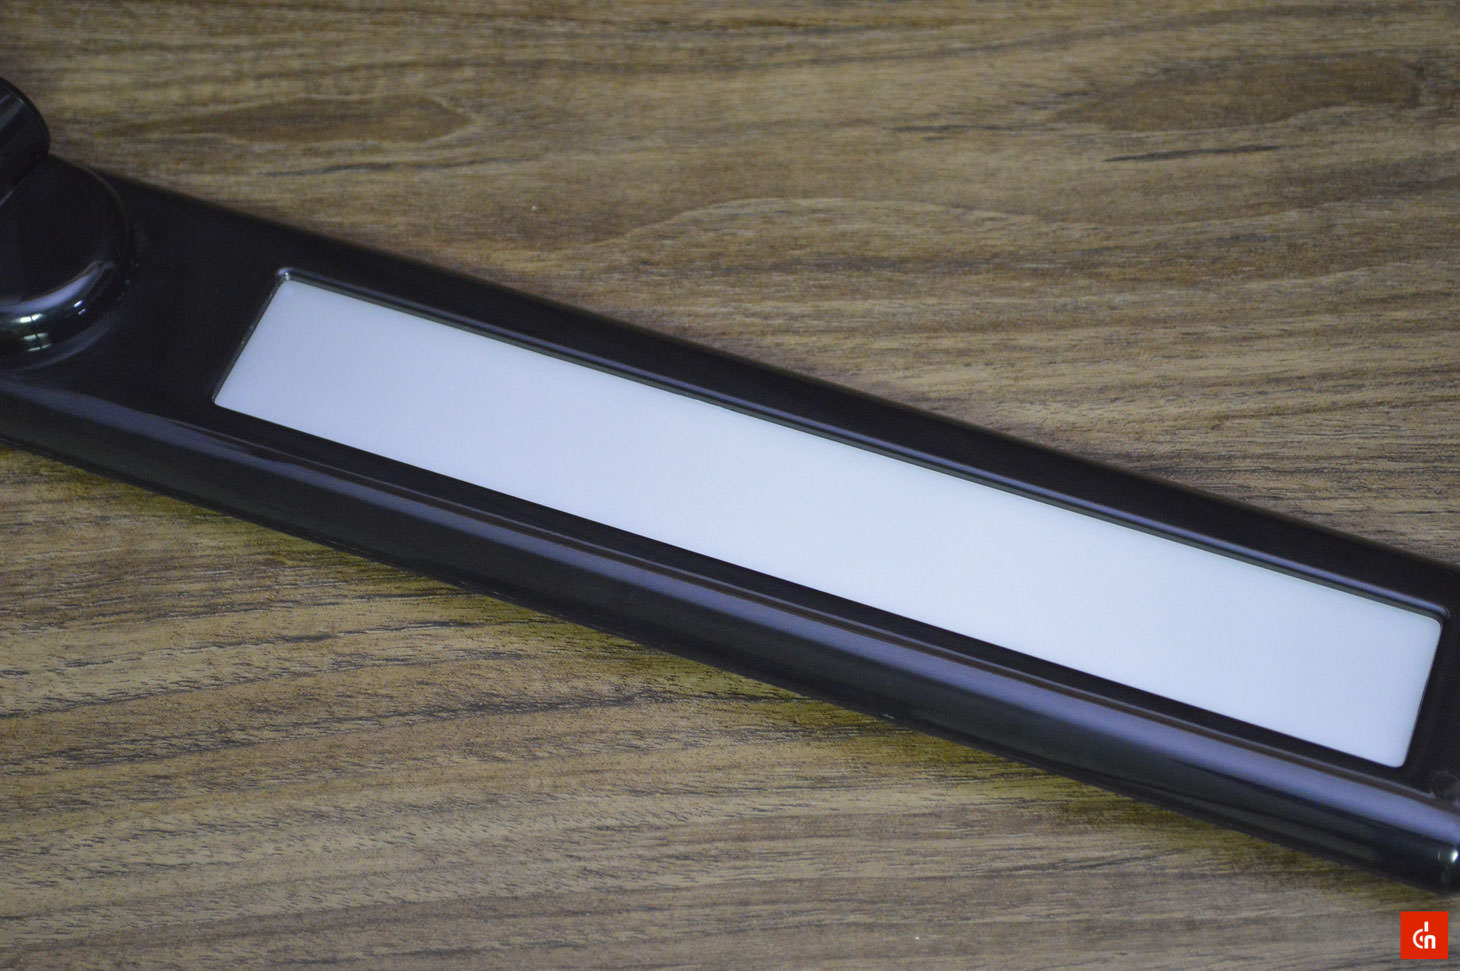 006_20160522_omaker-led-table-lamp